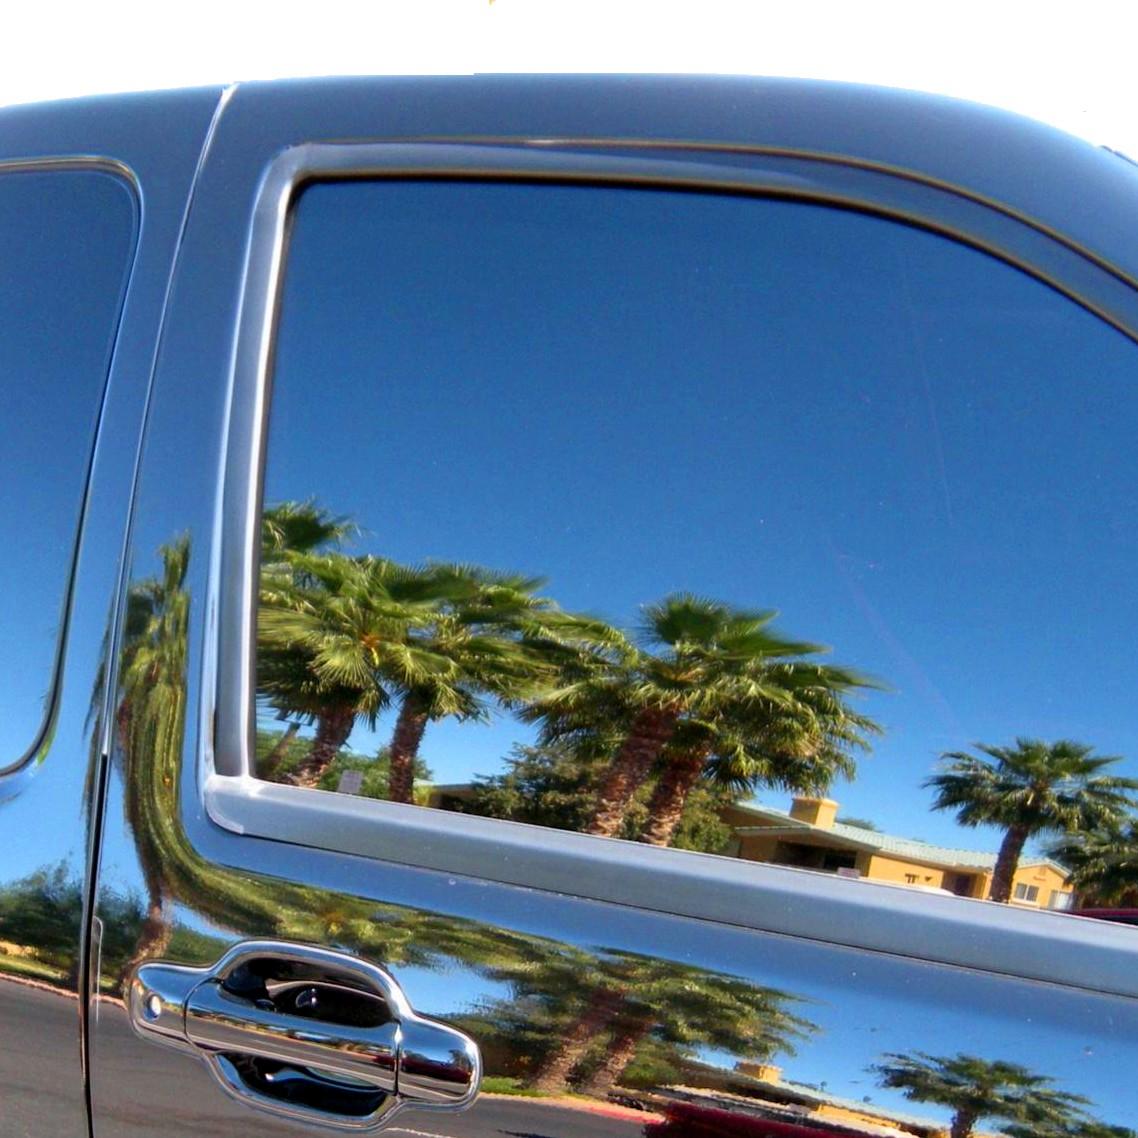 Reflective window mirrored film